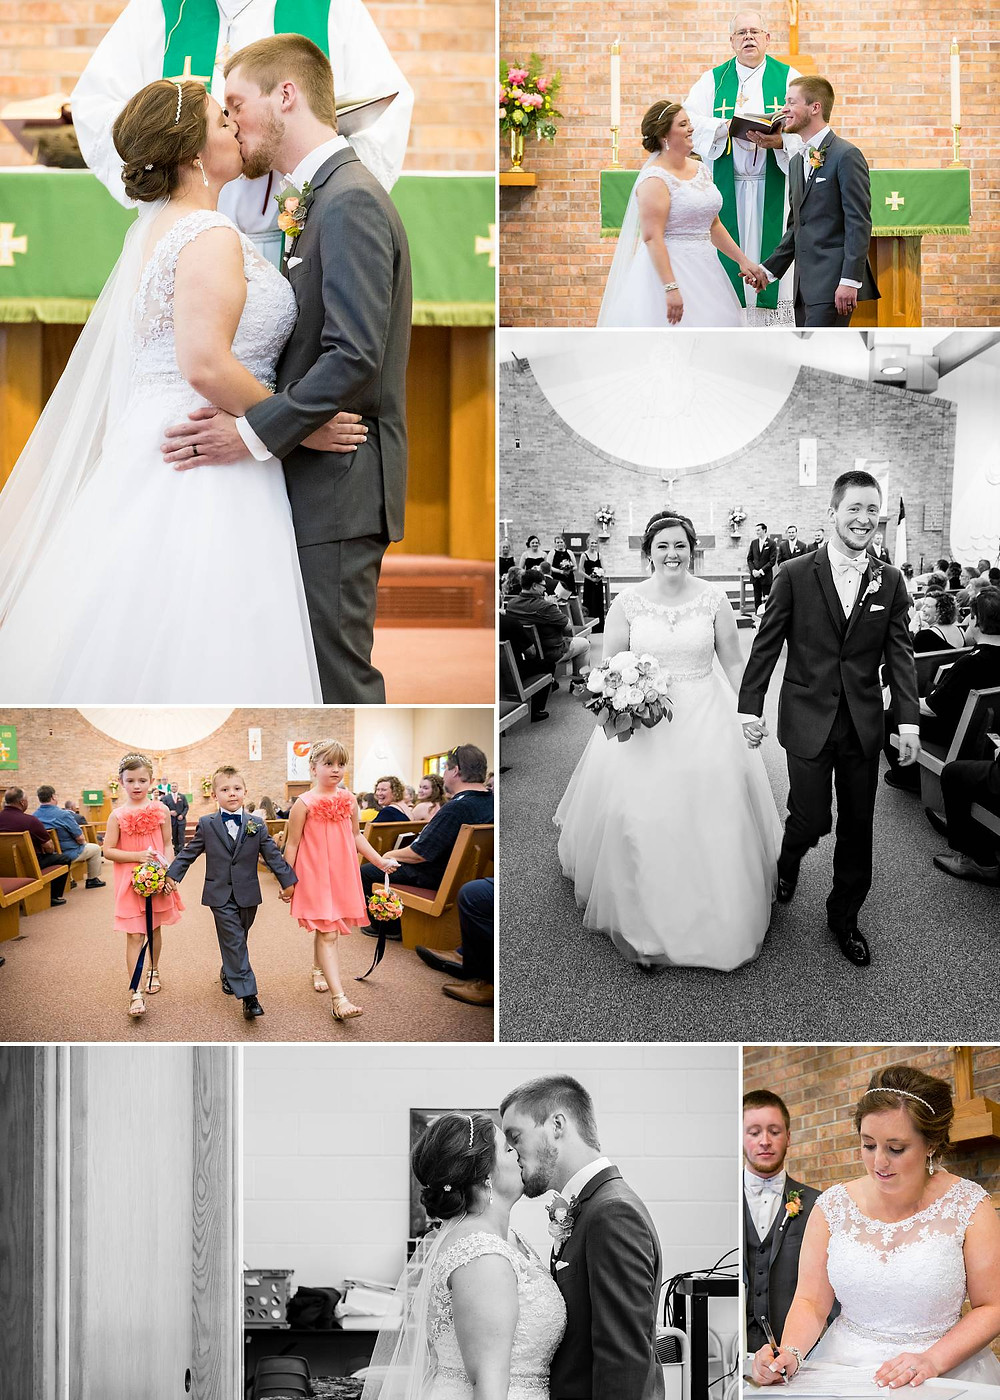 Oshkosh Wisconsin Summer Wedding Photographer | Lanari Photography